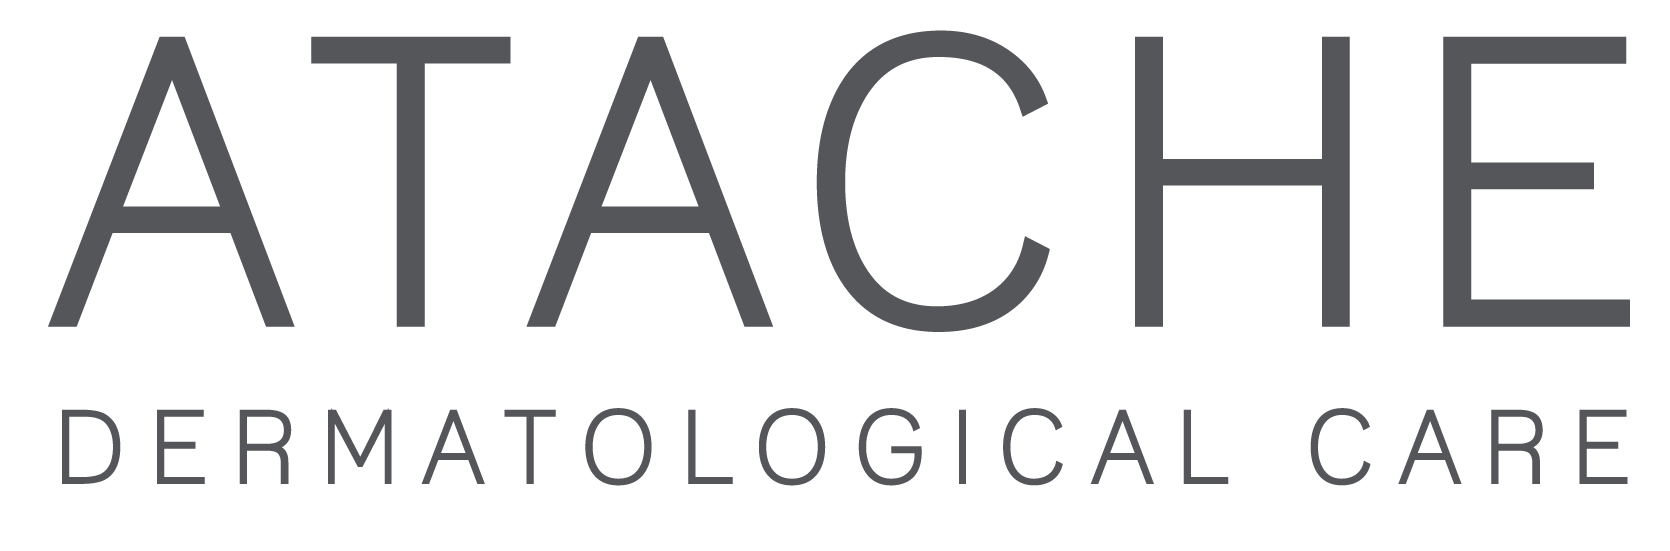 ATACHE DERMATOLOGICAL CARE